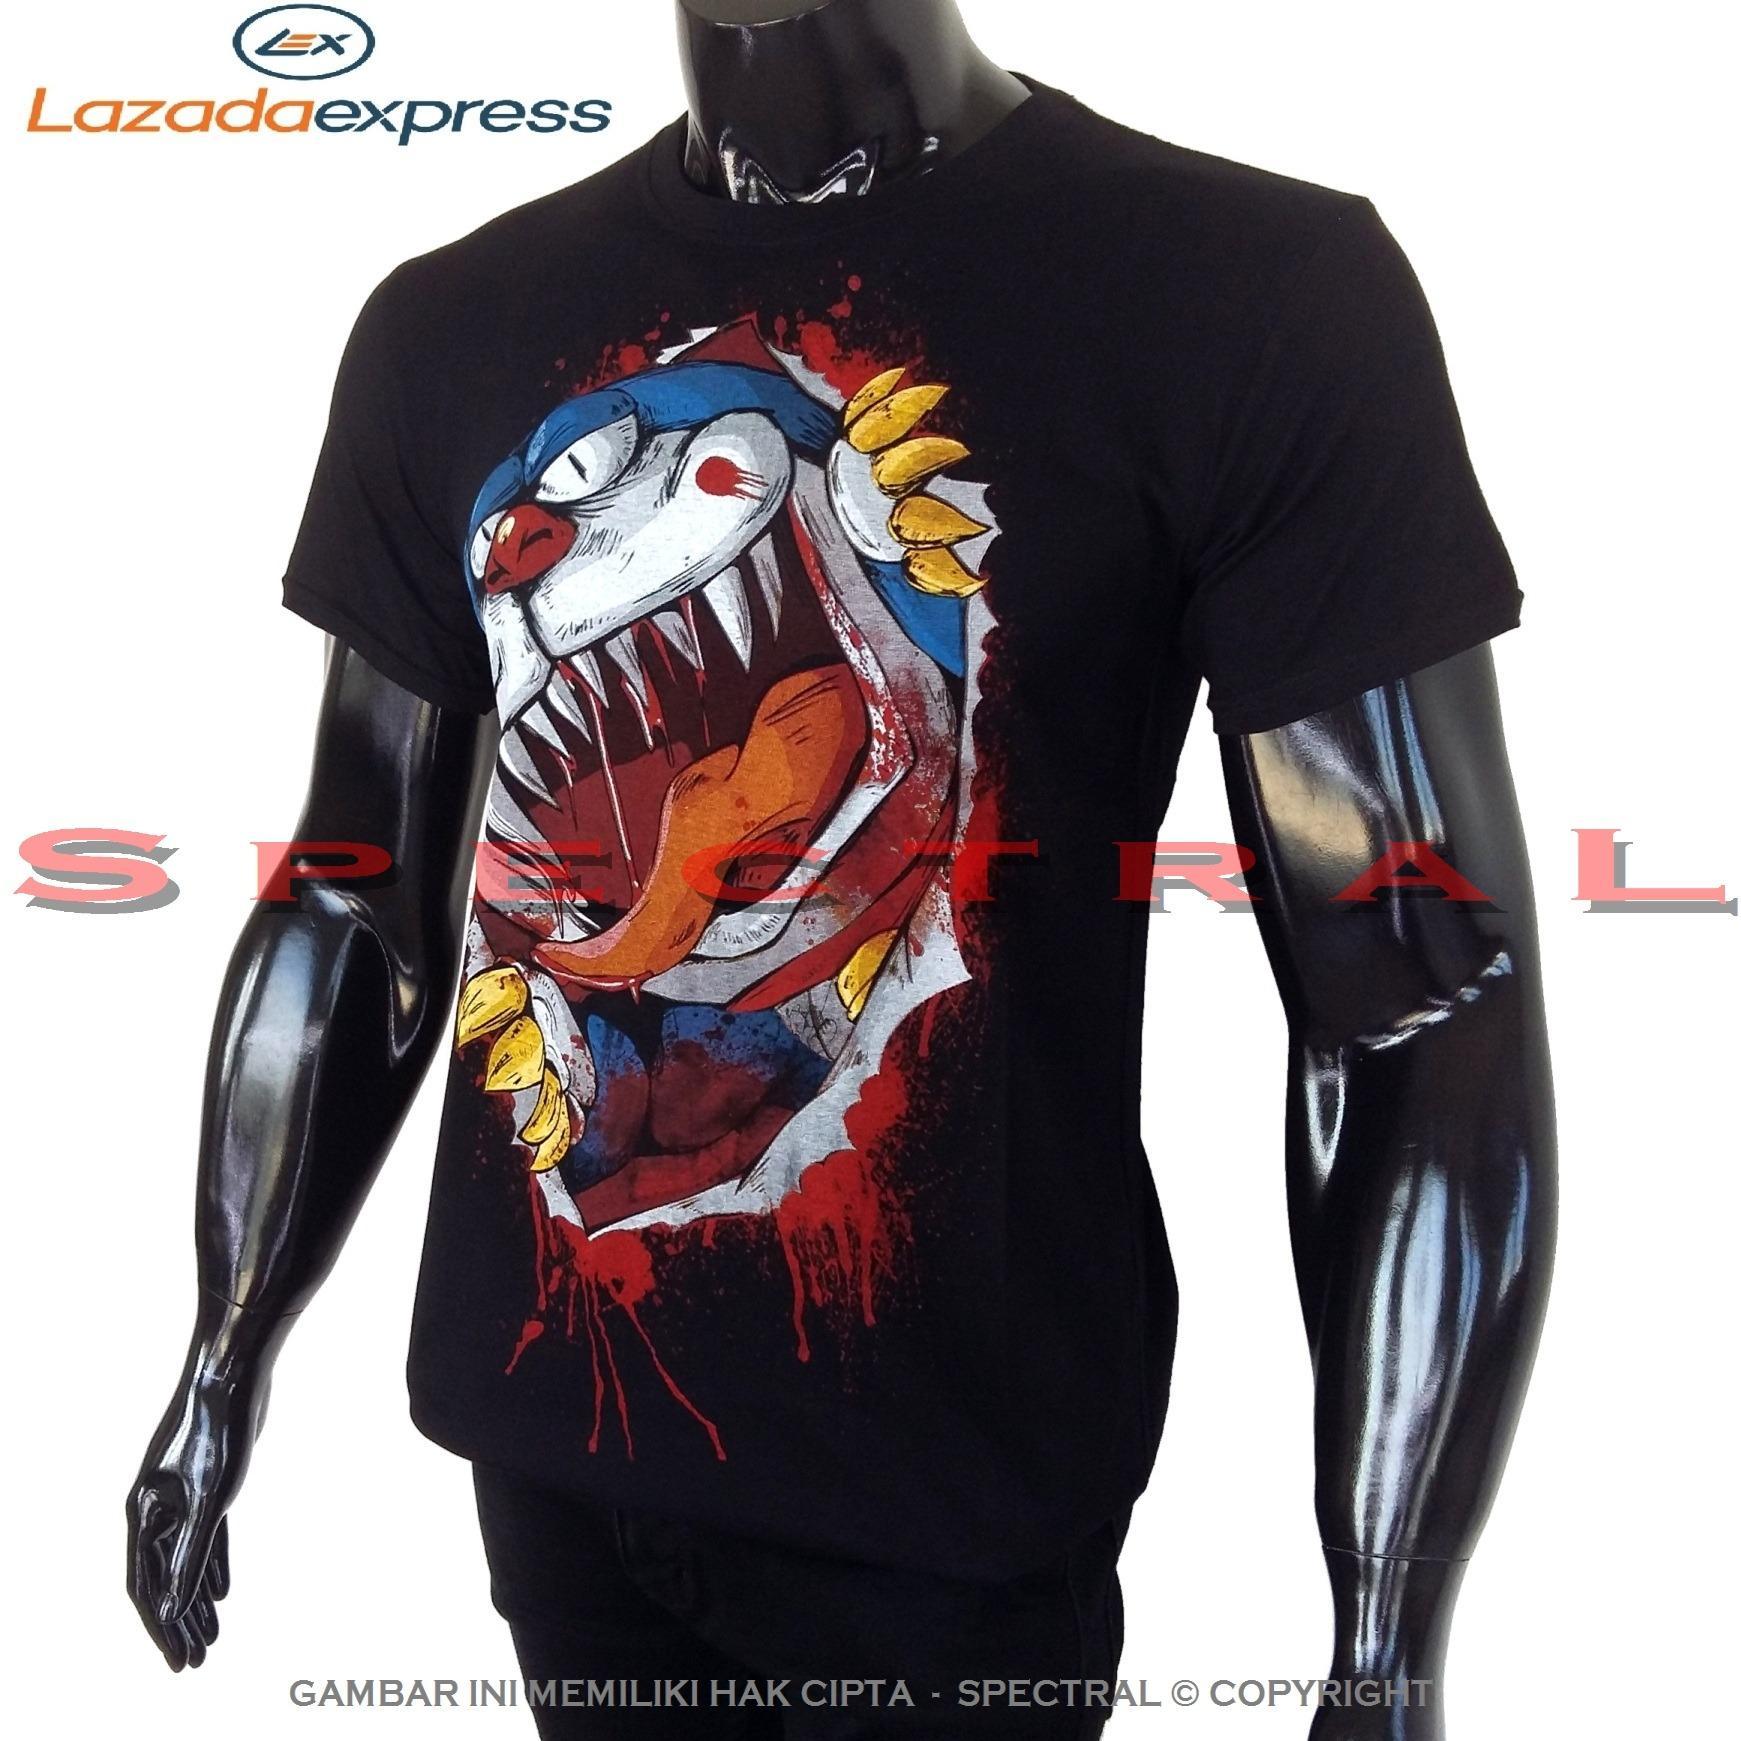 Spectral – DORAEMON ZOMBIE 100% Soft Cotton Combed 30s Kaos Distro Fashion T-Shirt Atasan Baju Pakaian Polos Shirt Pria Wanita Cewe Cowo  Lengan Murah Bagus Keren Jaman Kekinian Jakarta Bandung Tumblr Hitam Gambar Animasi Kartun Superhero Lucu Horror